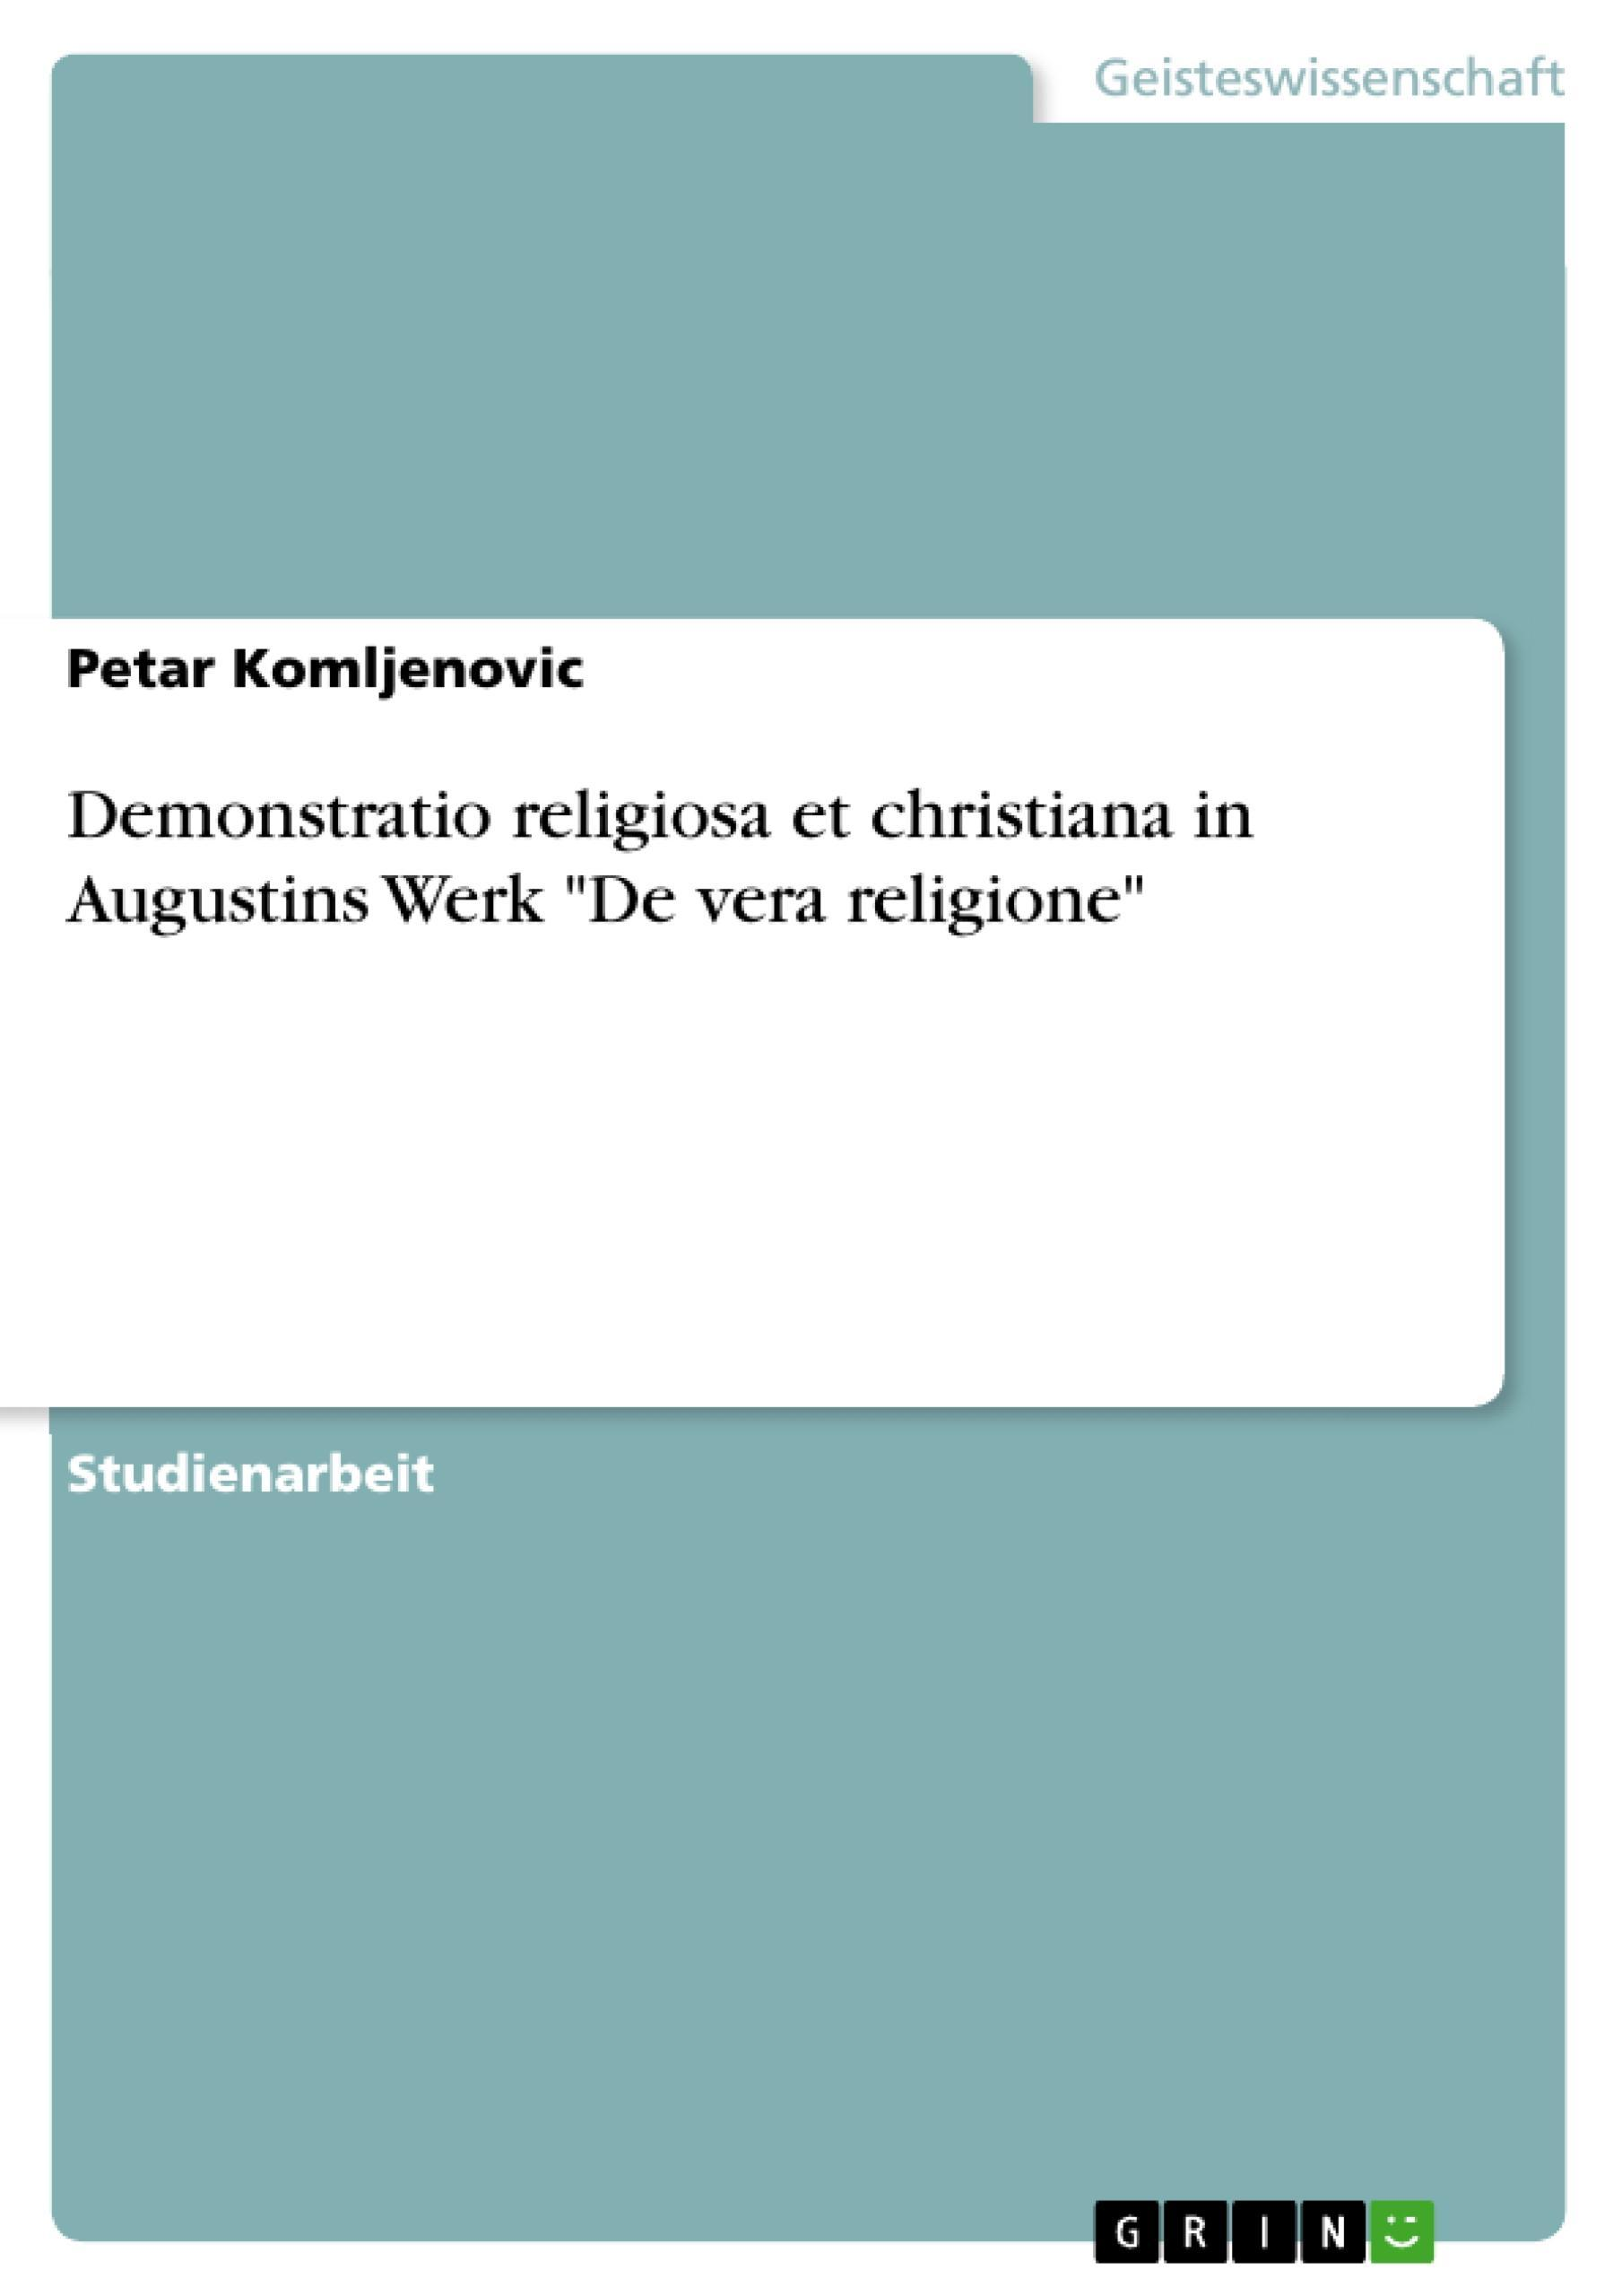 "Demonstratio religiosa et christiana in Augustins Werk """"De vera religione"" ..."